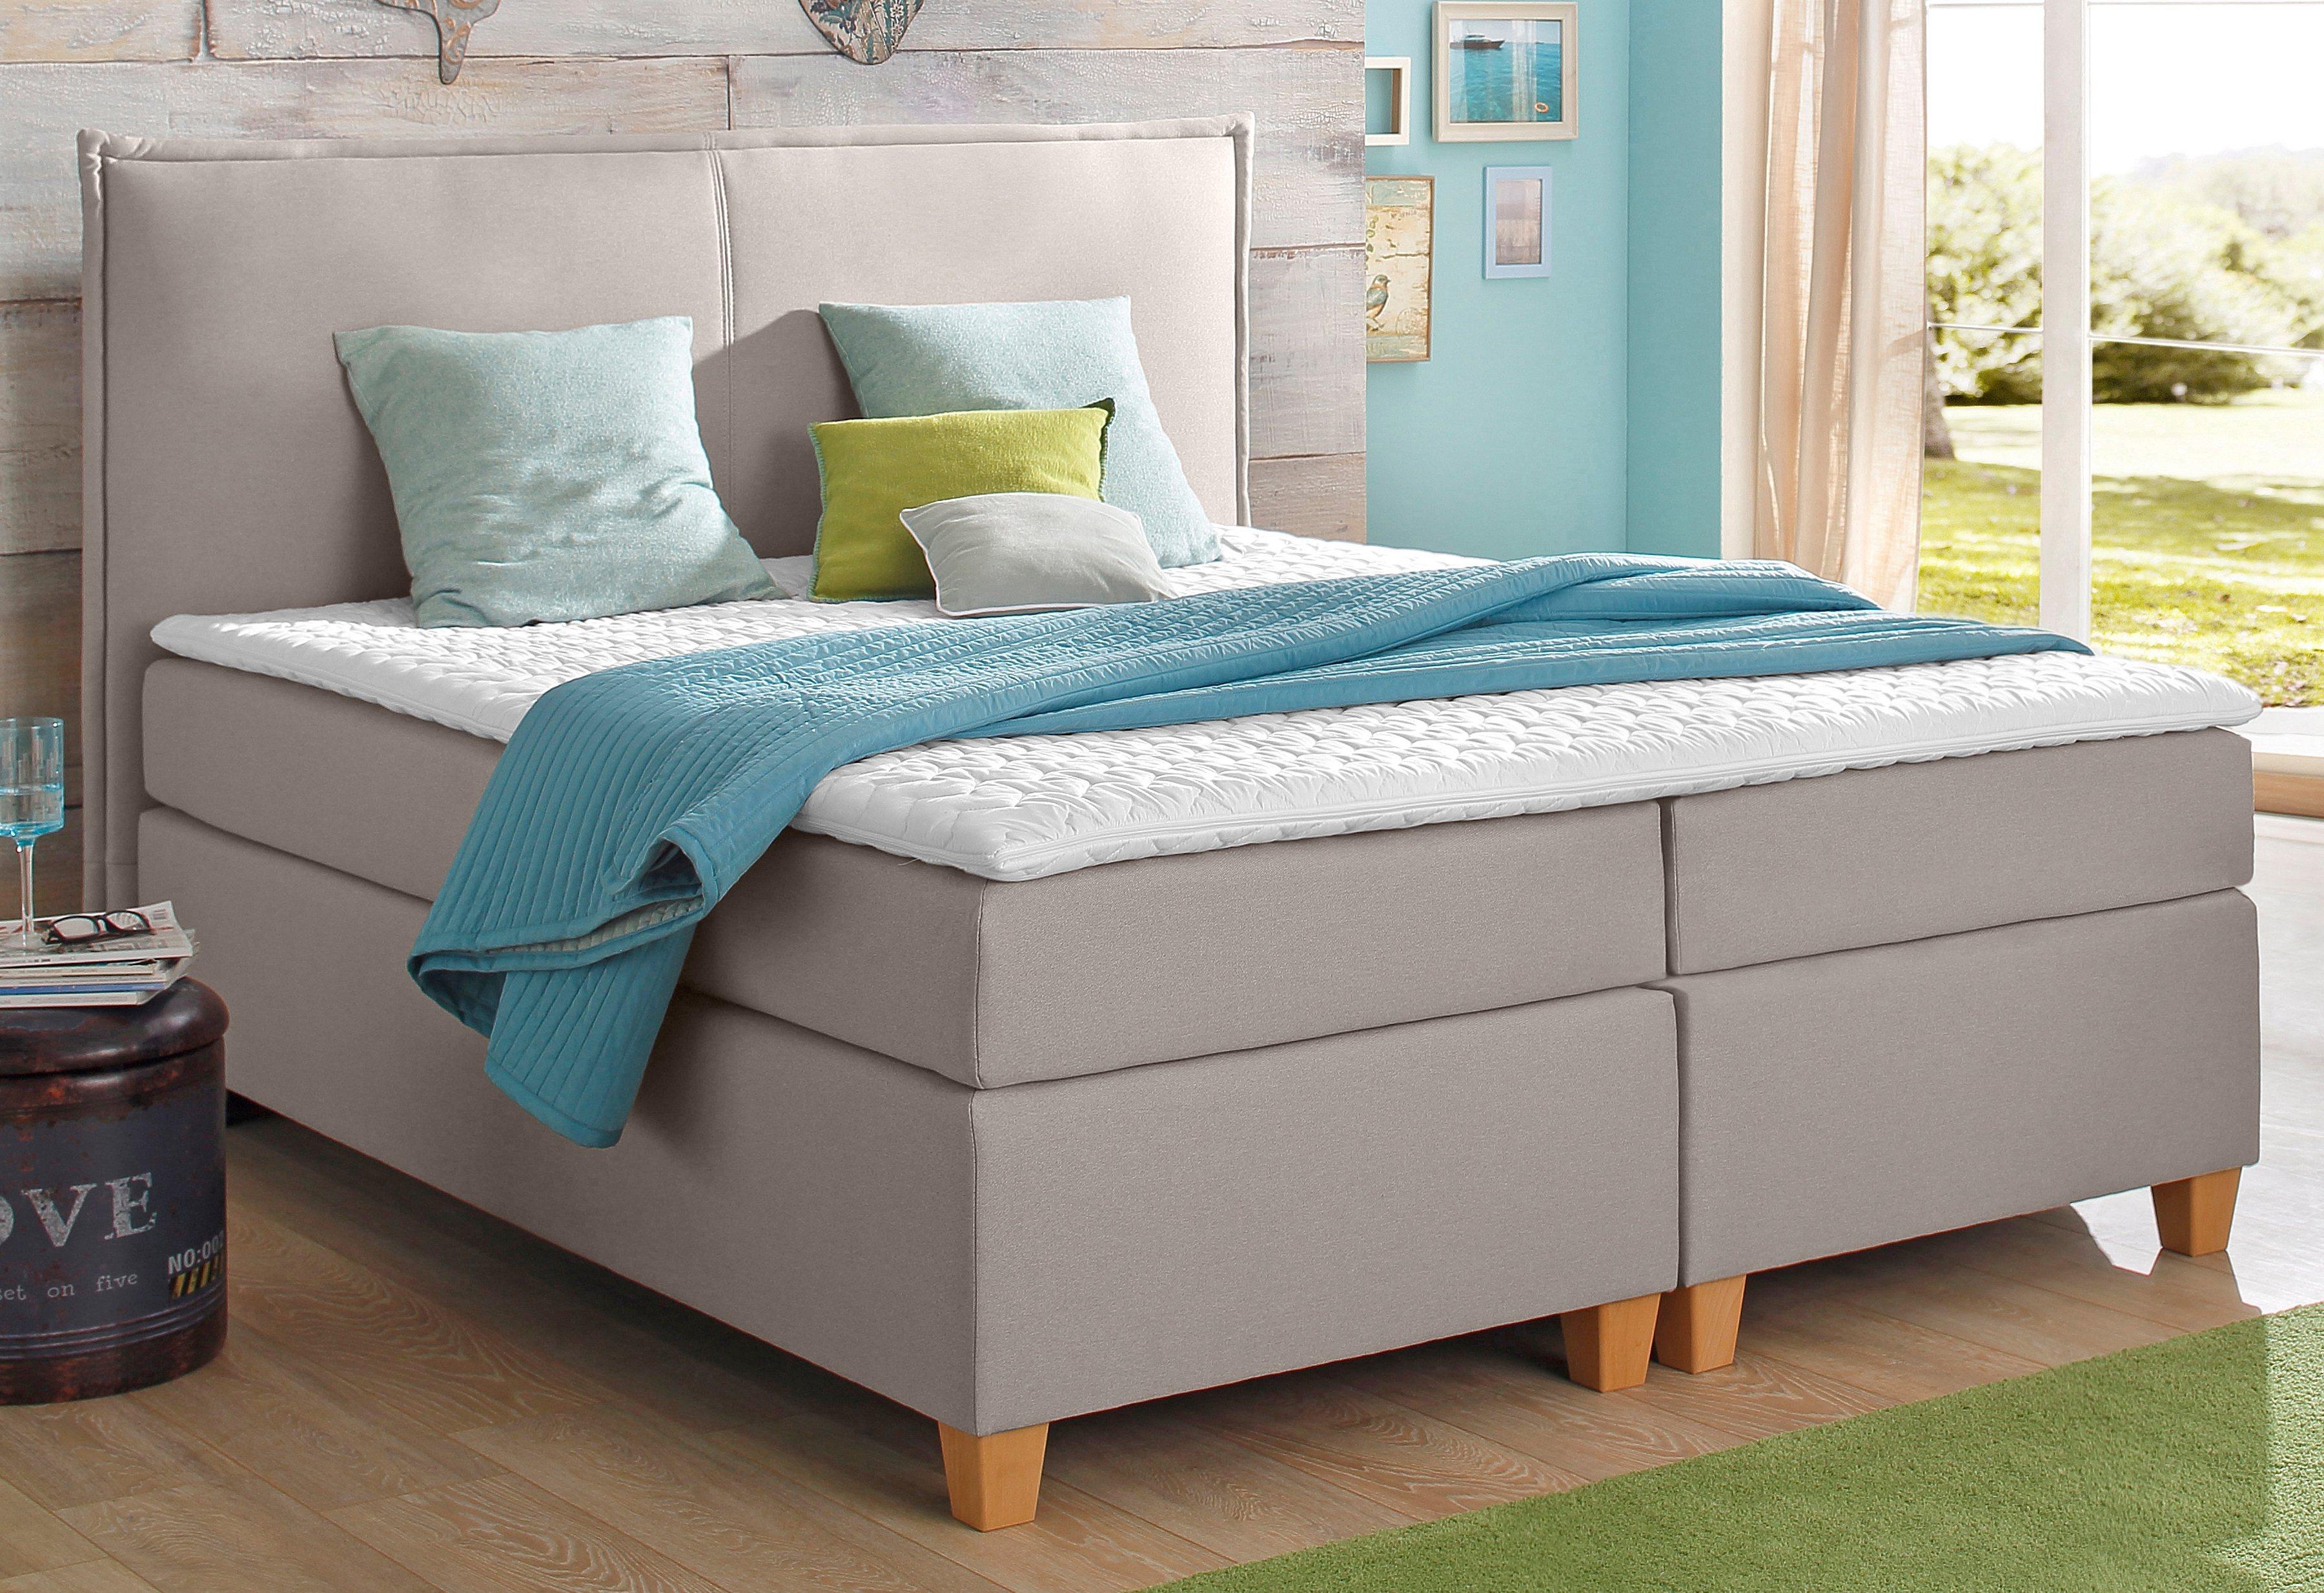 22 sparen boxspringbett maxim von home affaire ab 349 99 cherry m bel otto. Black Bedroom Furniture Sets. Home Design Ideas